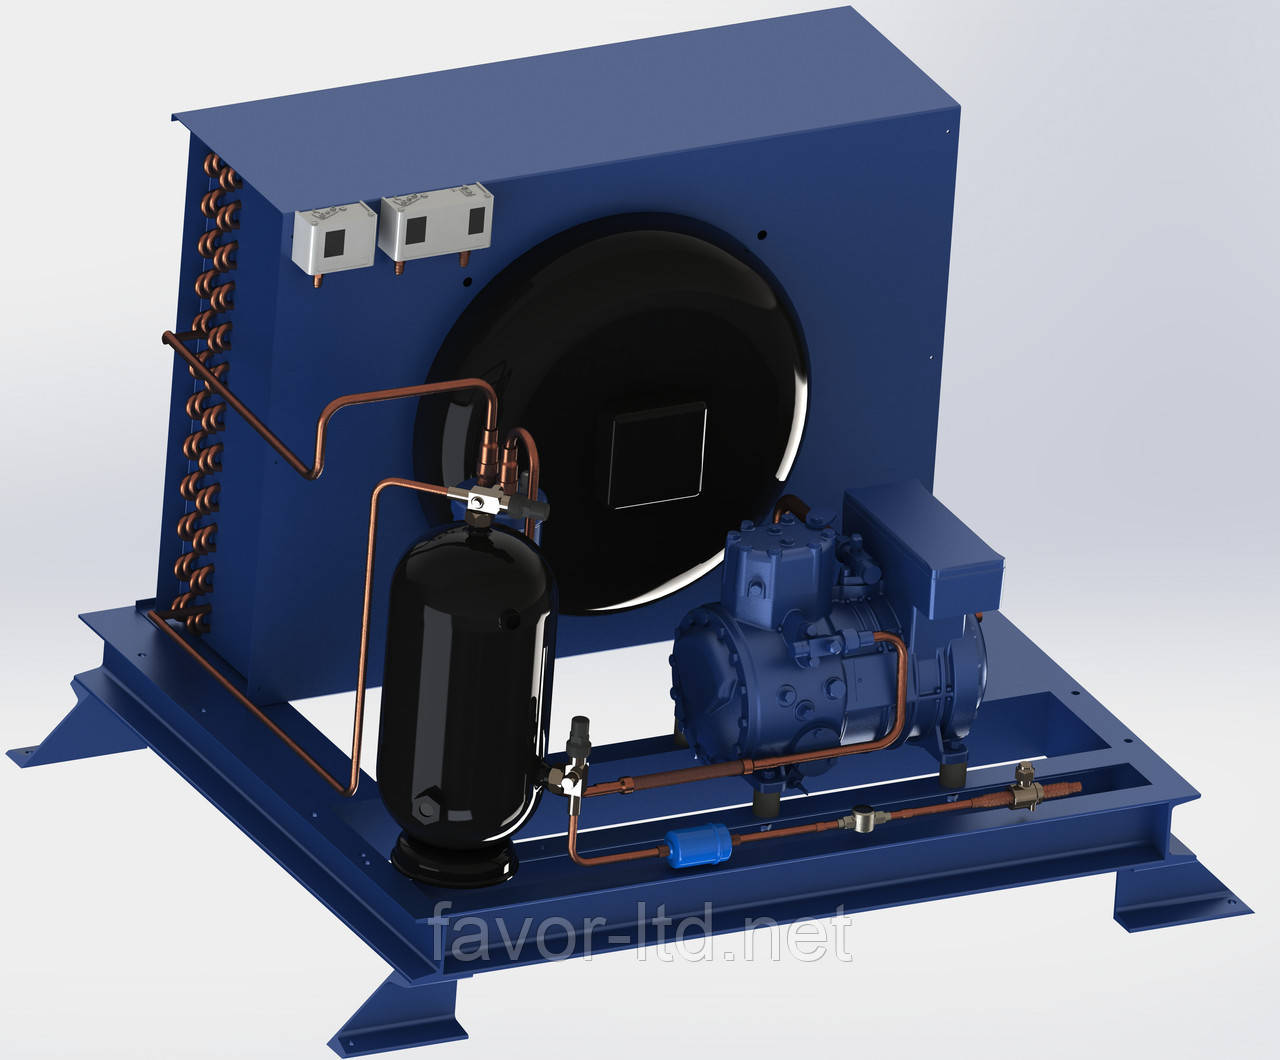 Компресорно-конденсаторний агрегат низькотемпературний Frascold LB14/ D2-13,1 Y